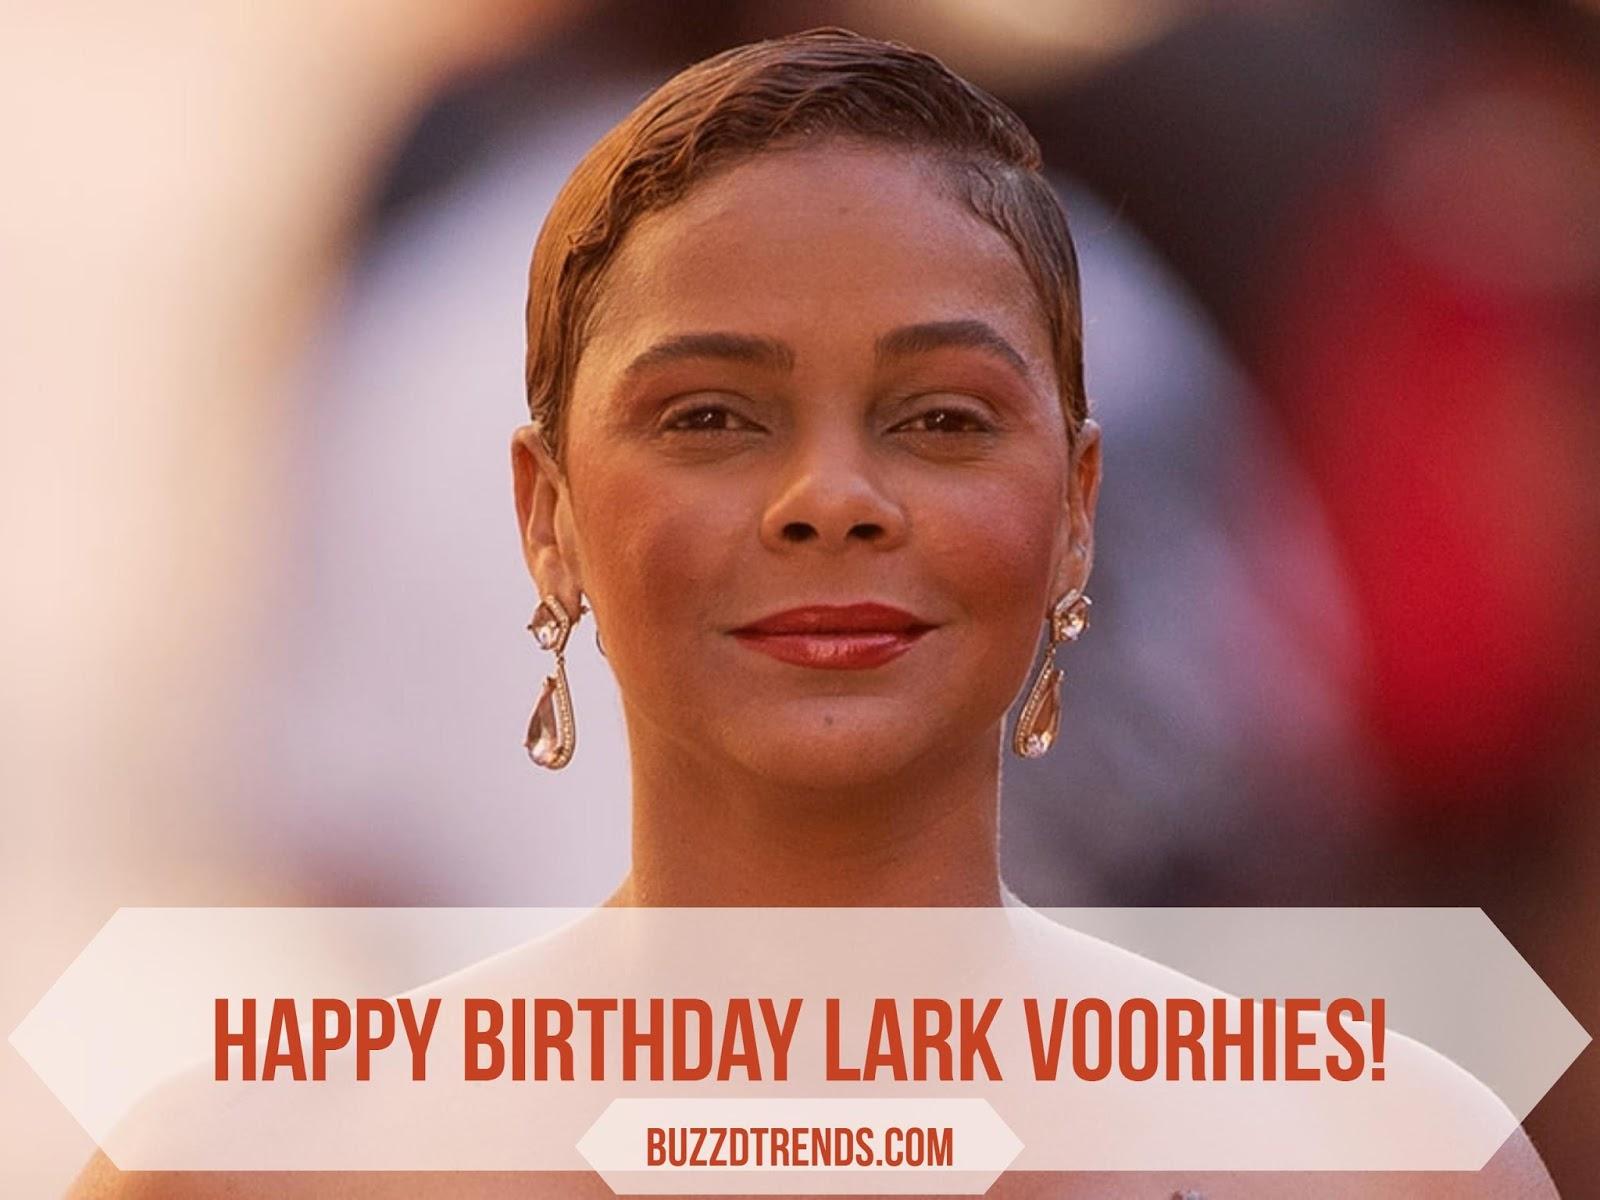 Lark Voorhies born March 25, 1974 (age 44)